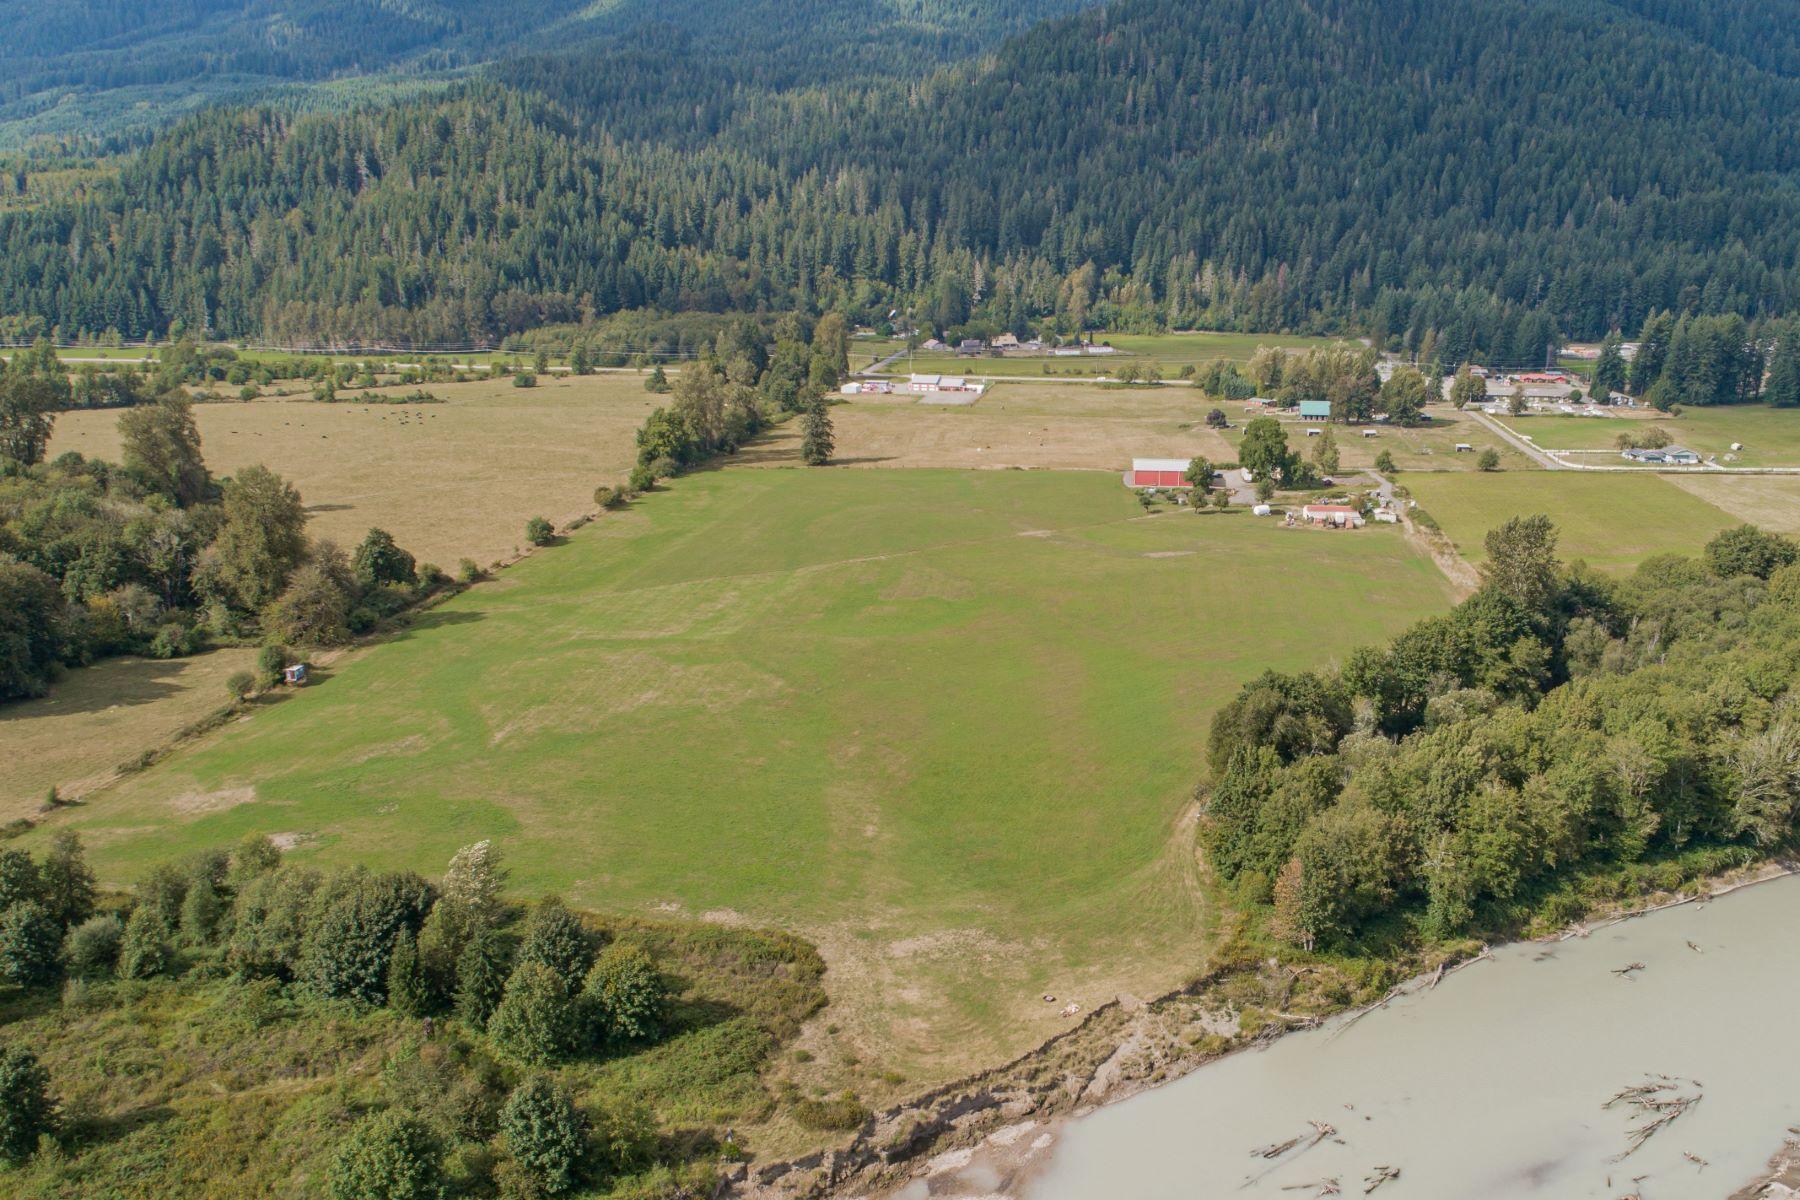 Land for Sale at 115 Kehoe Rd Randle, Washington 98377 United States